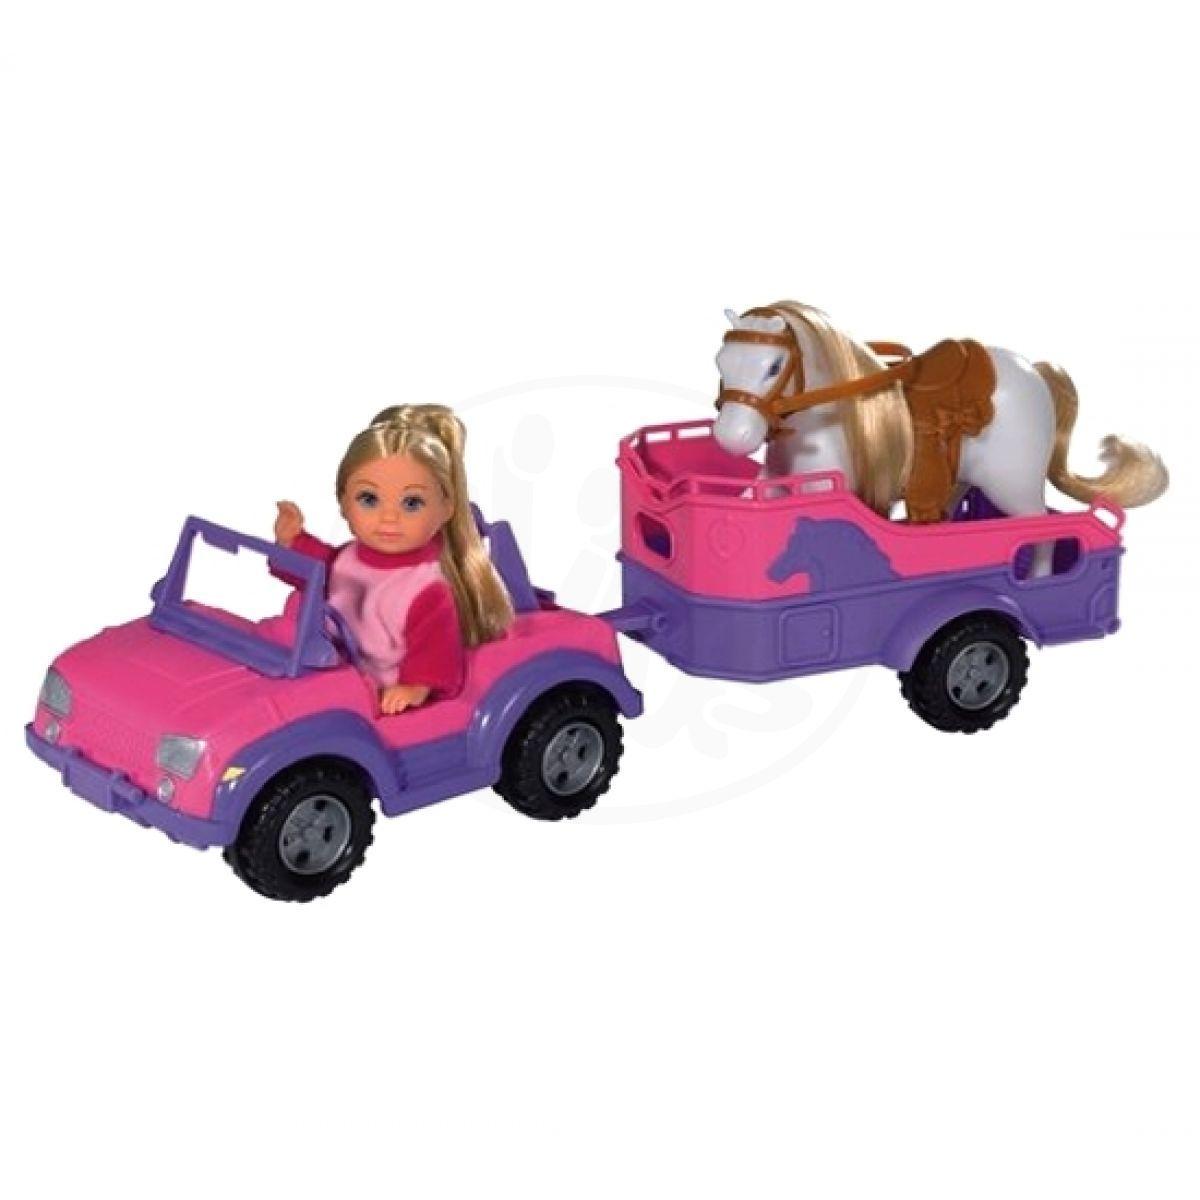 Simba Steffi Love panenka Evička jeep + koník